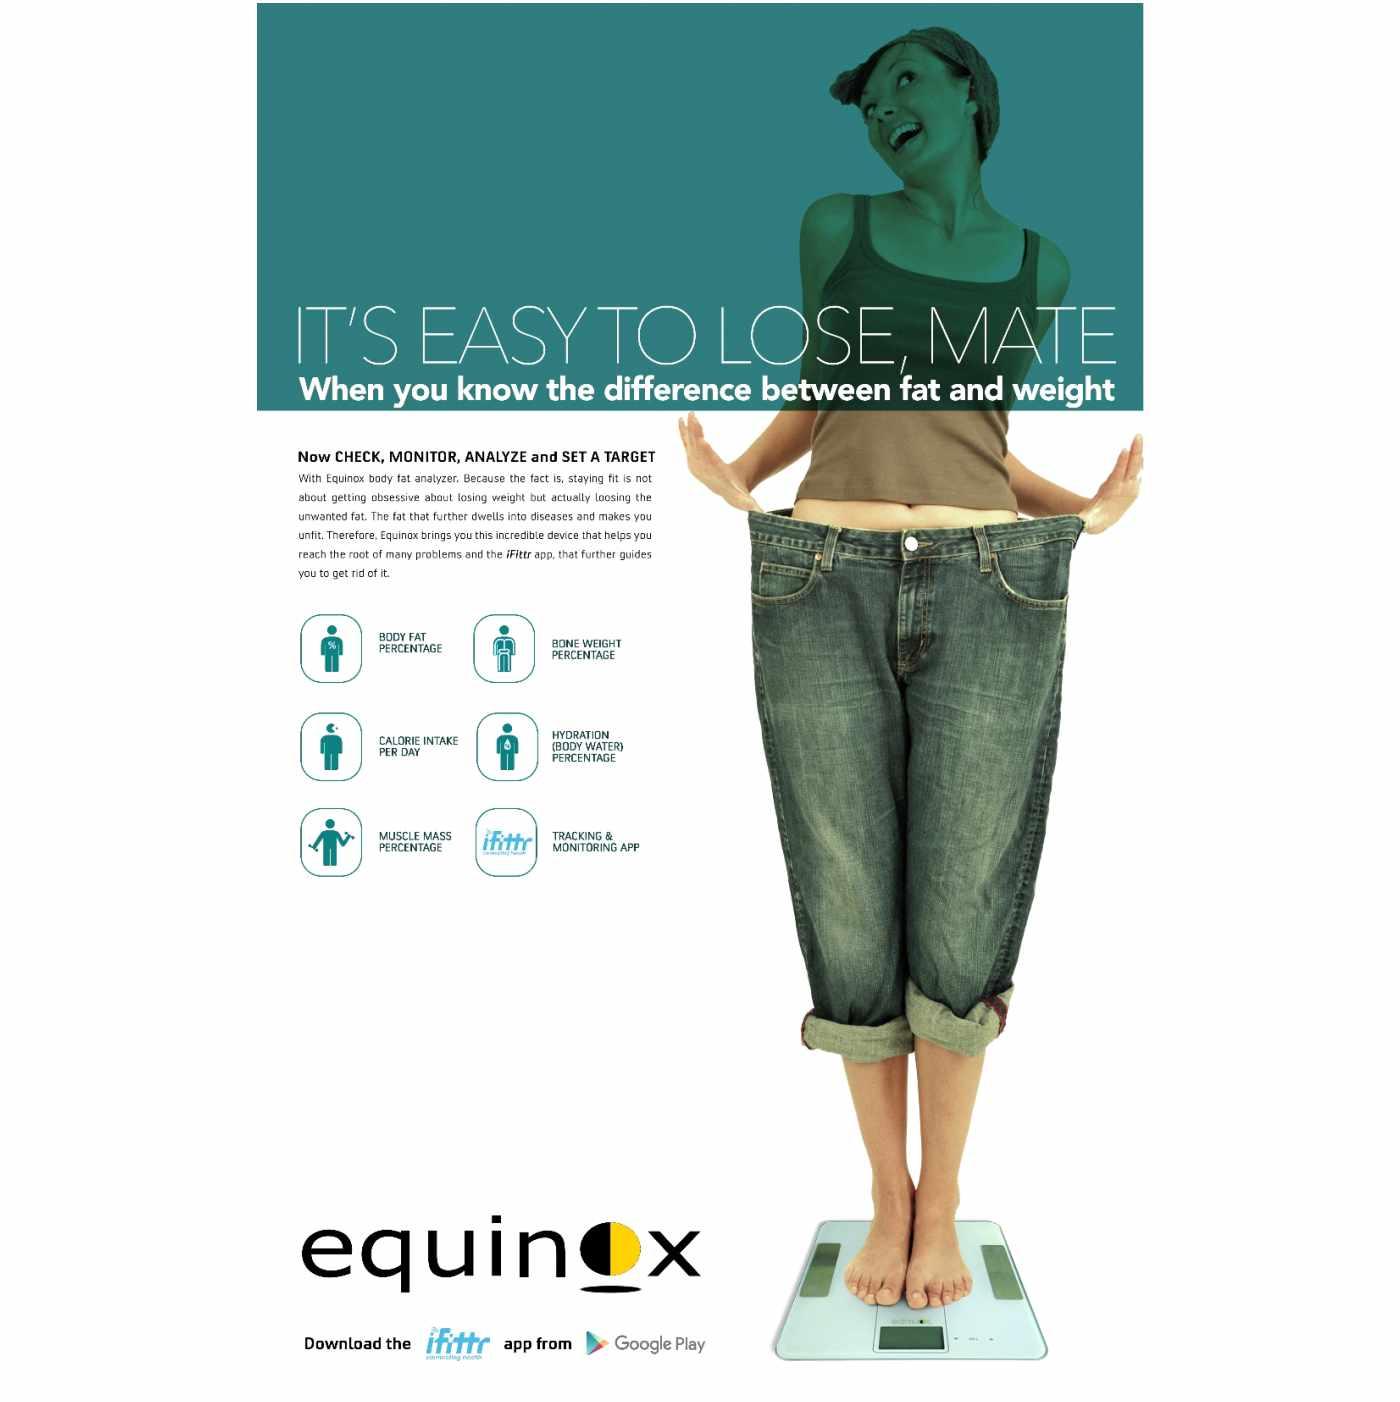 Equinox_7